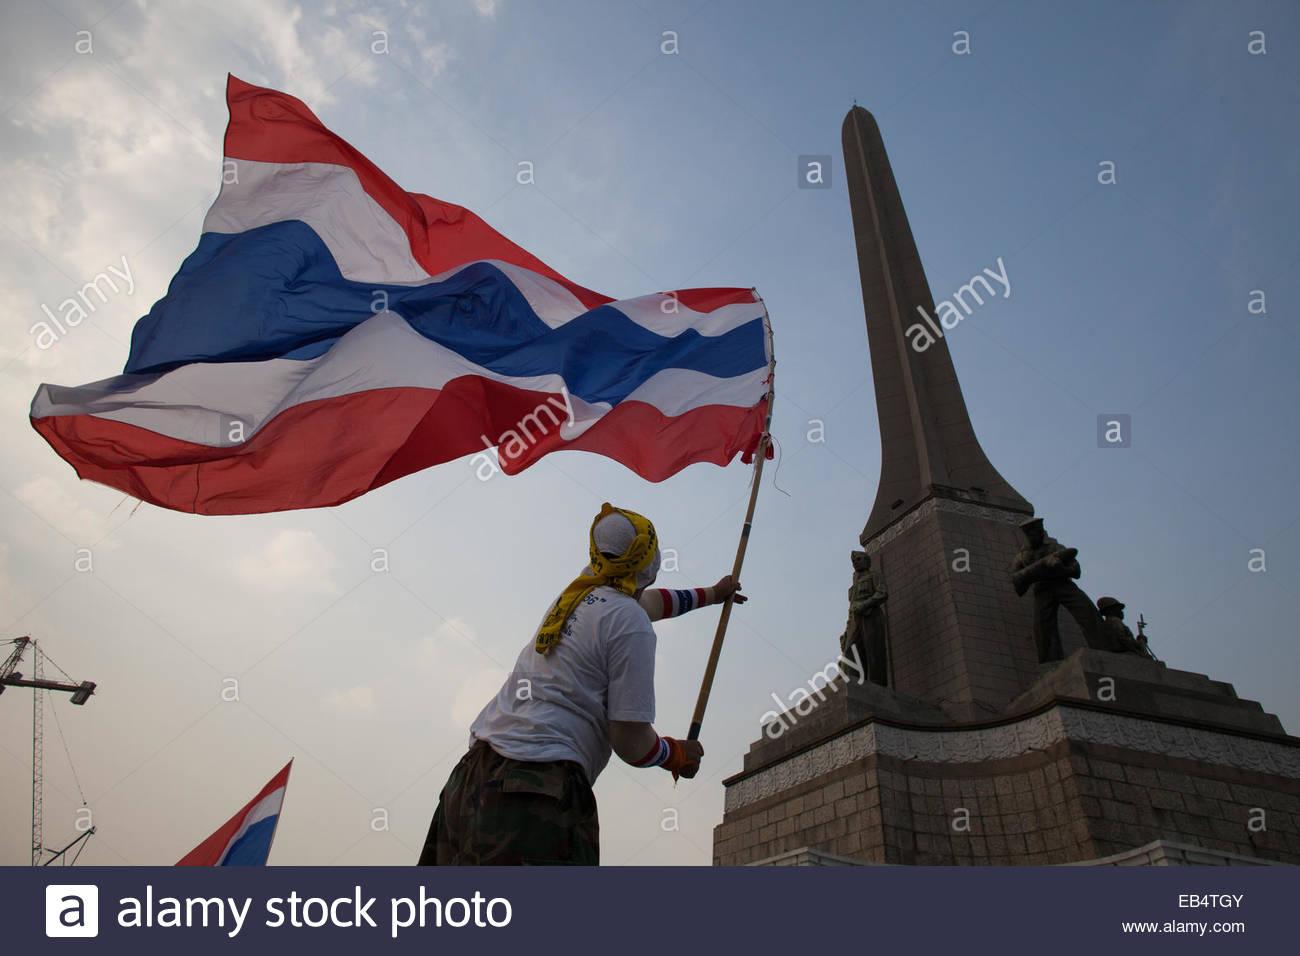 A protestor waves a flag at a rally in Victory Square, Bangkok. - Stock Image